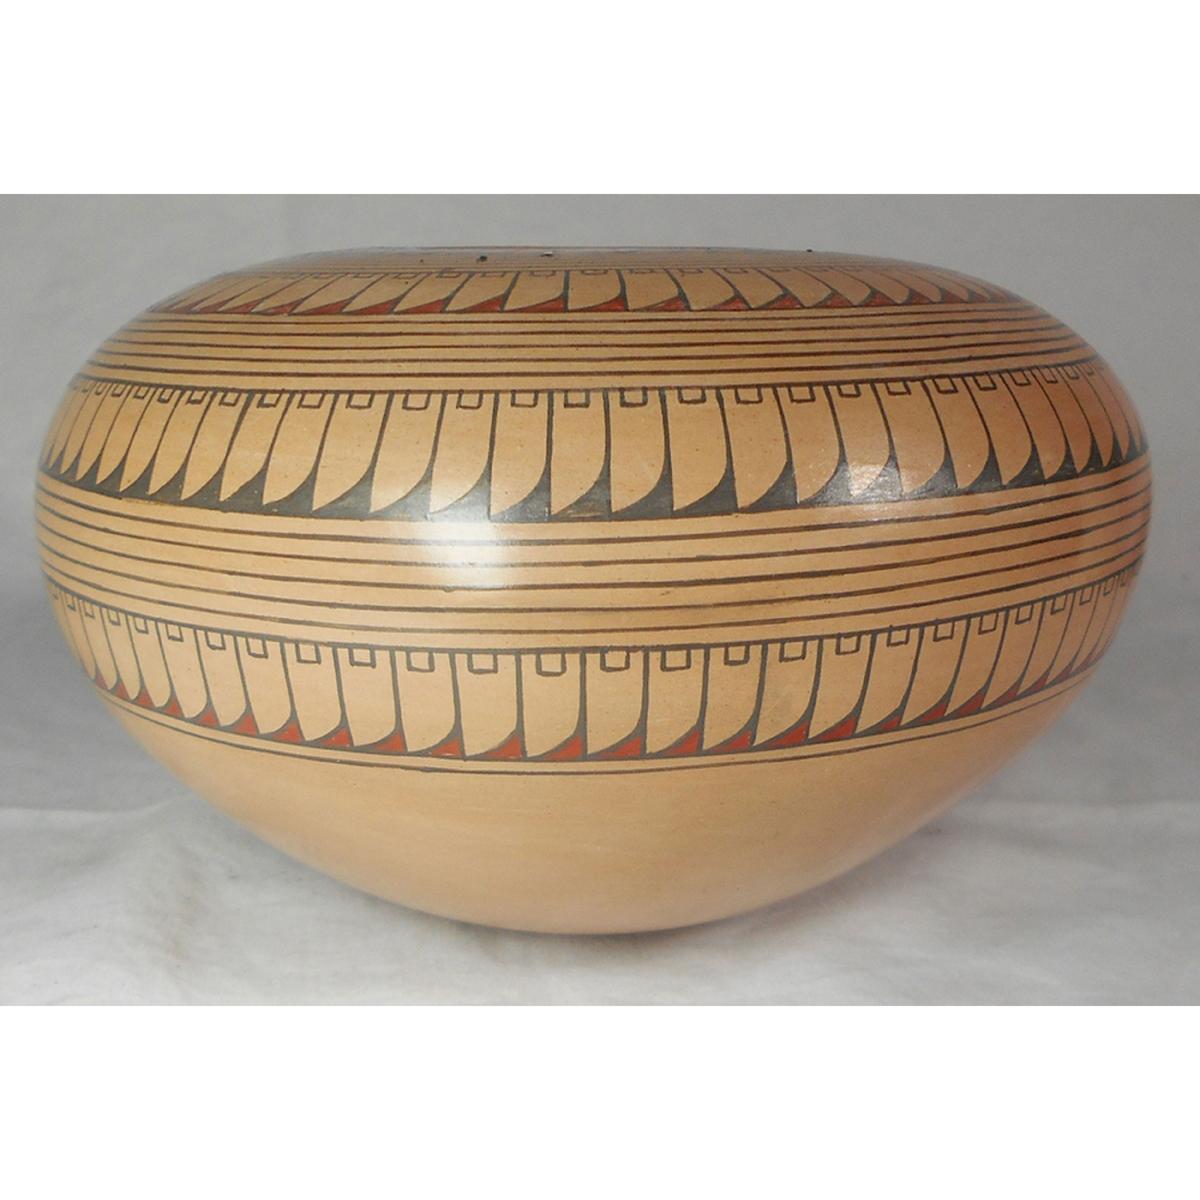 Mata Ortiz Pottery by Ruben Rodriguez